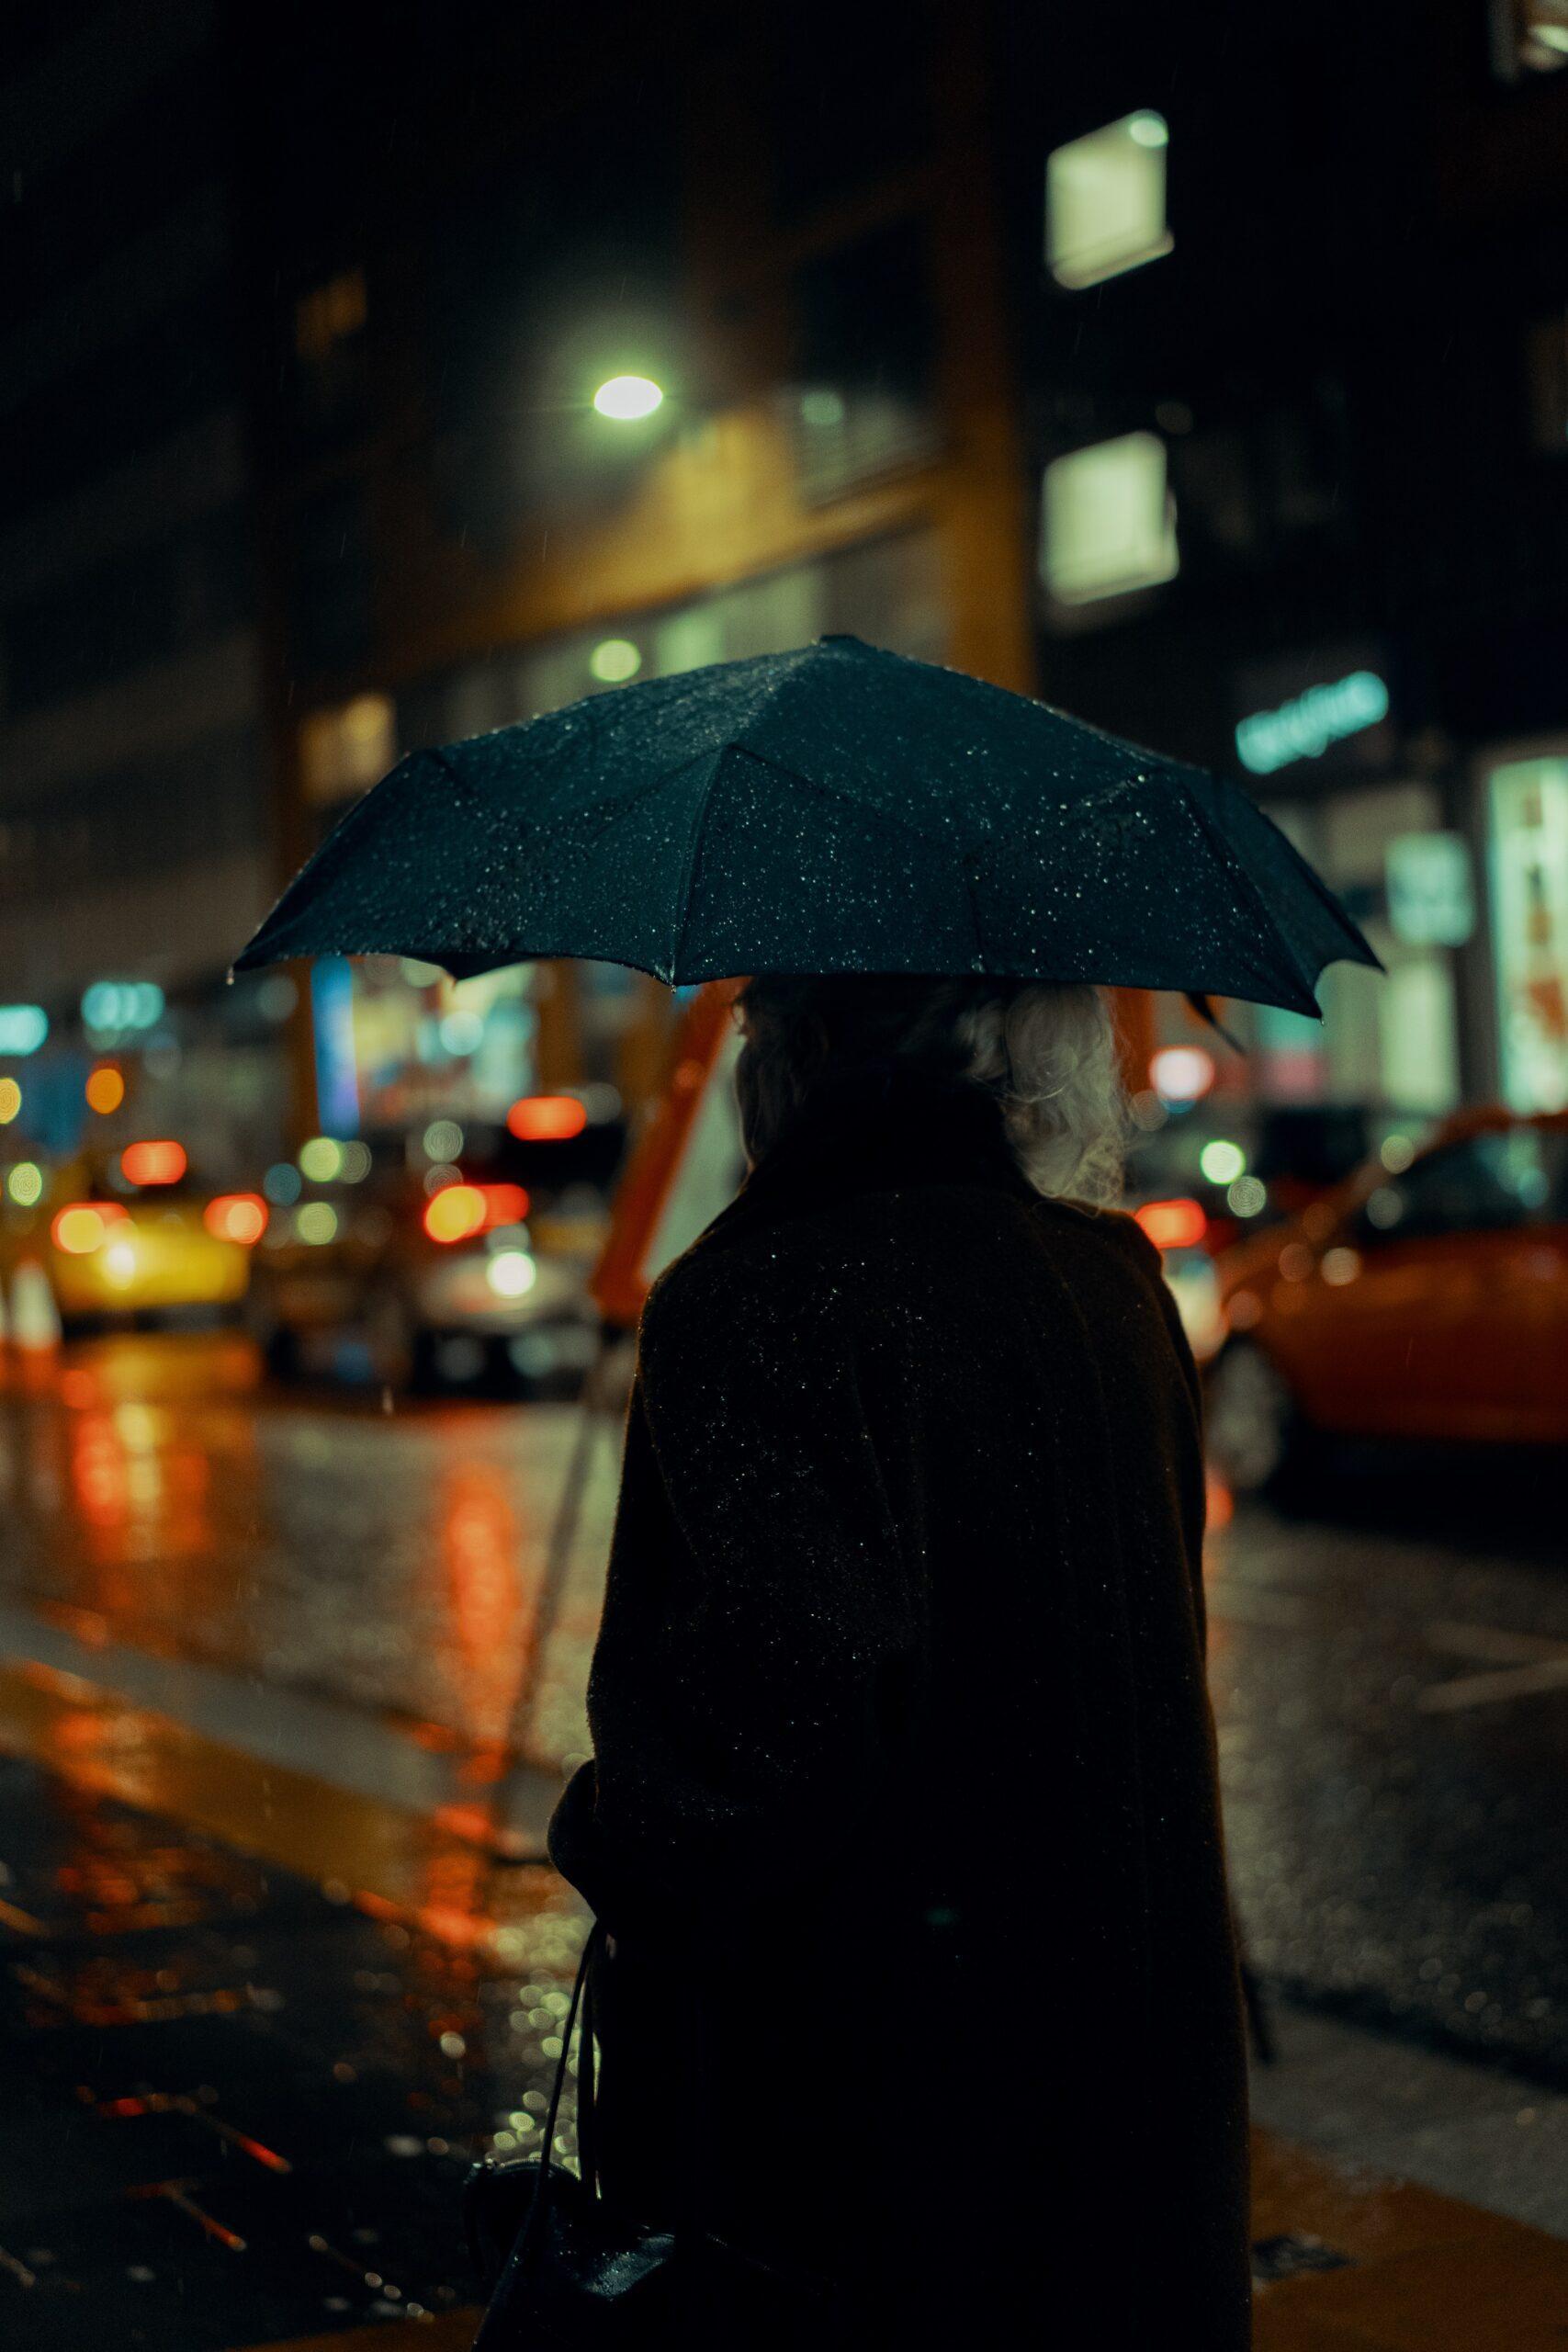 ross-sneddon-_Glasgow City rainy night man walking wet streets-unsplash